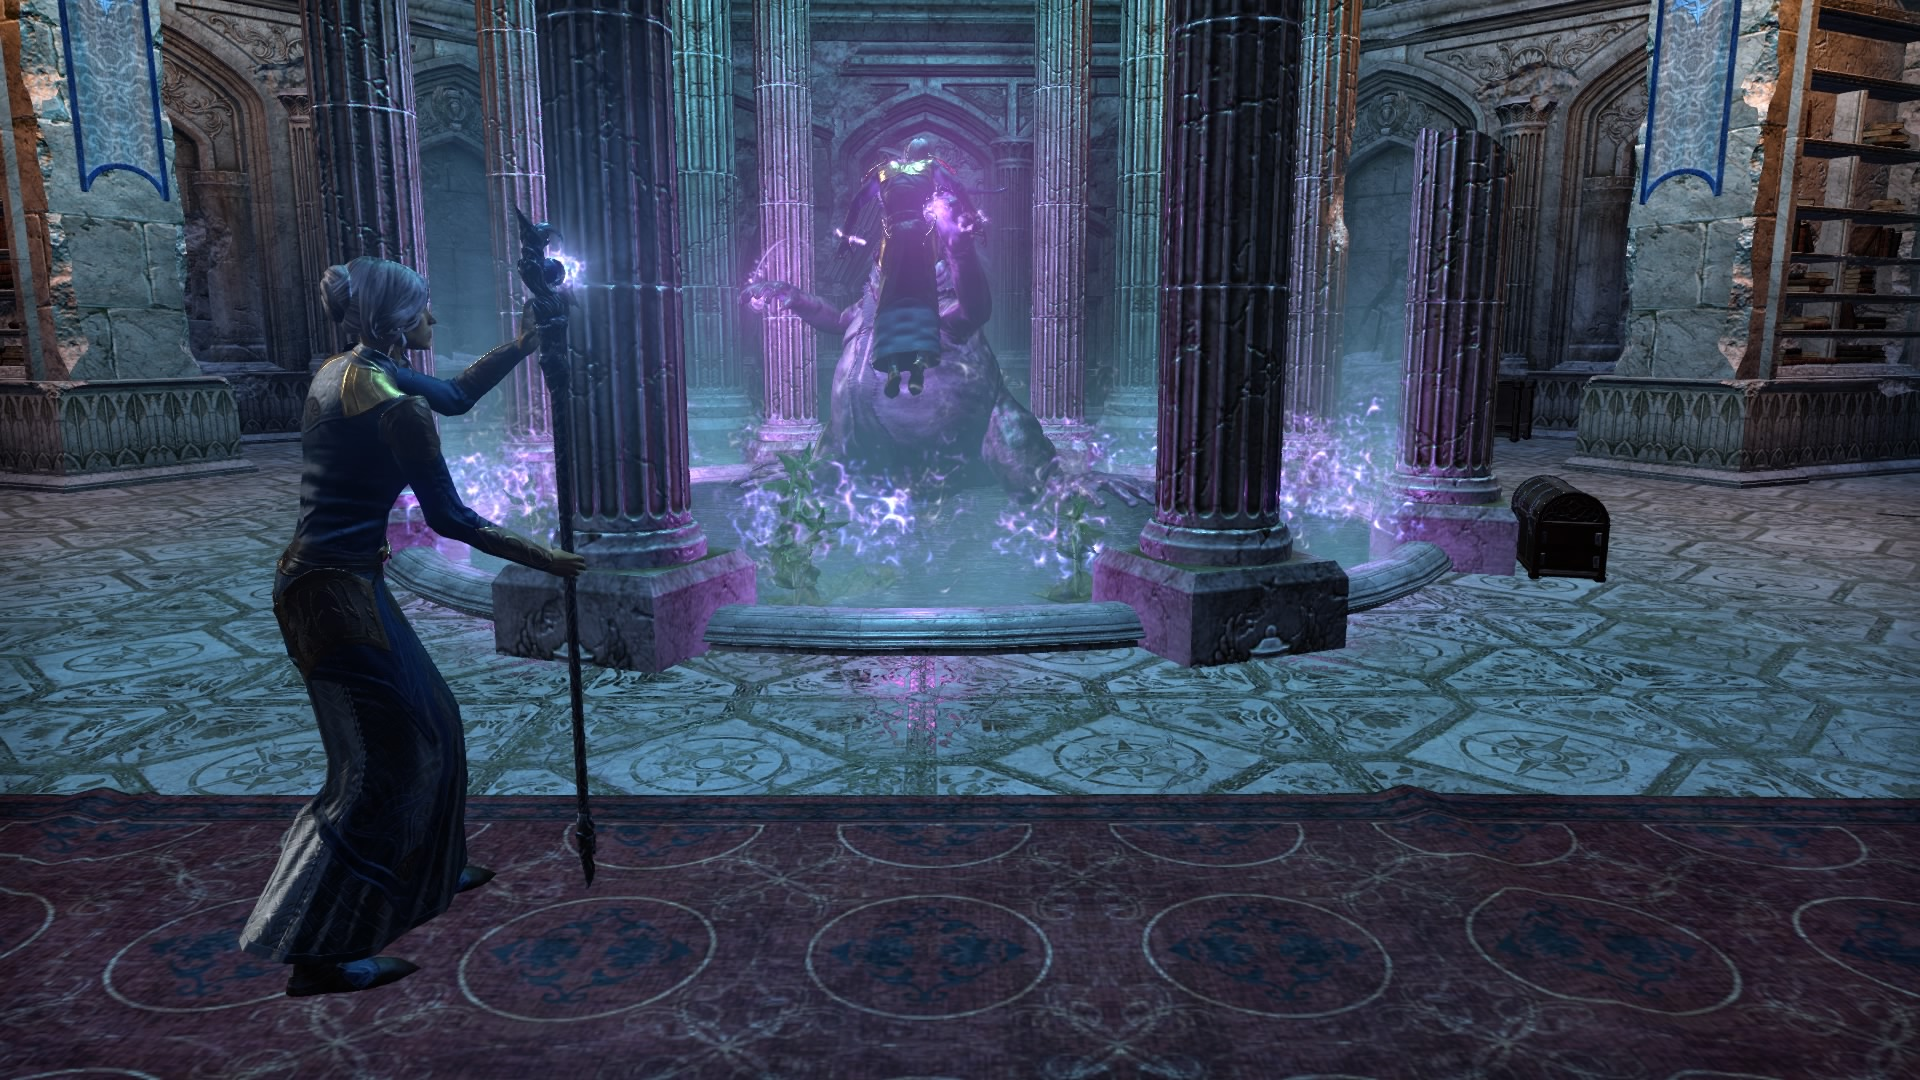 Using the Ul'vor Staff to break into K'Tora's Mind